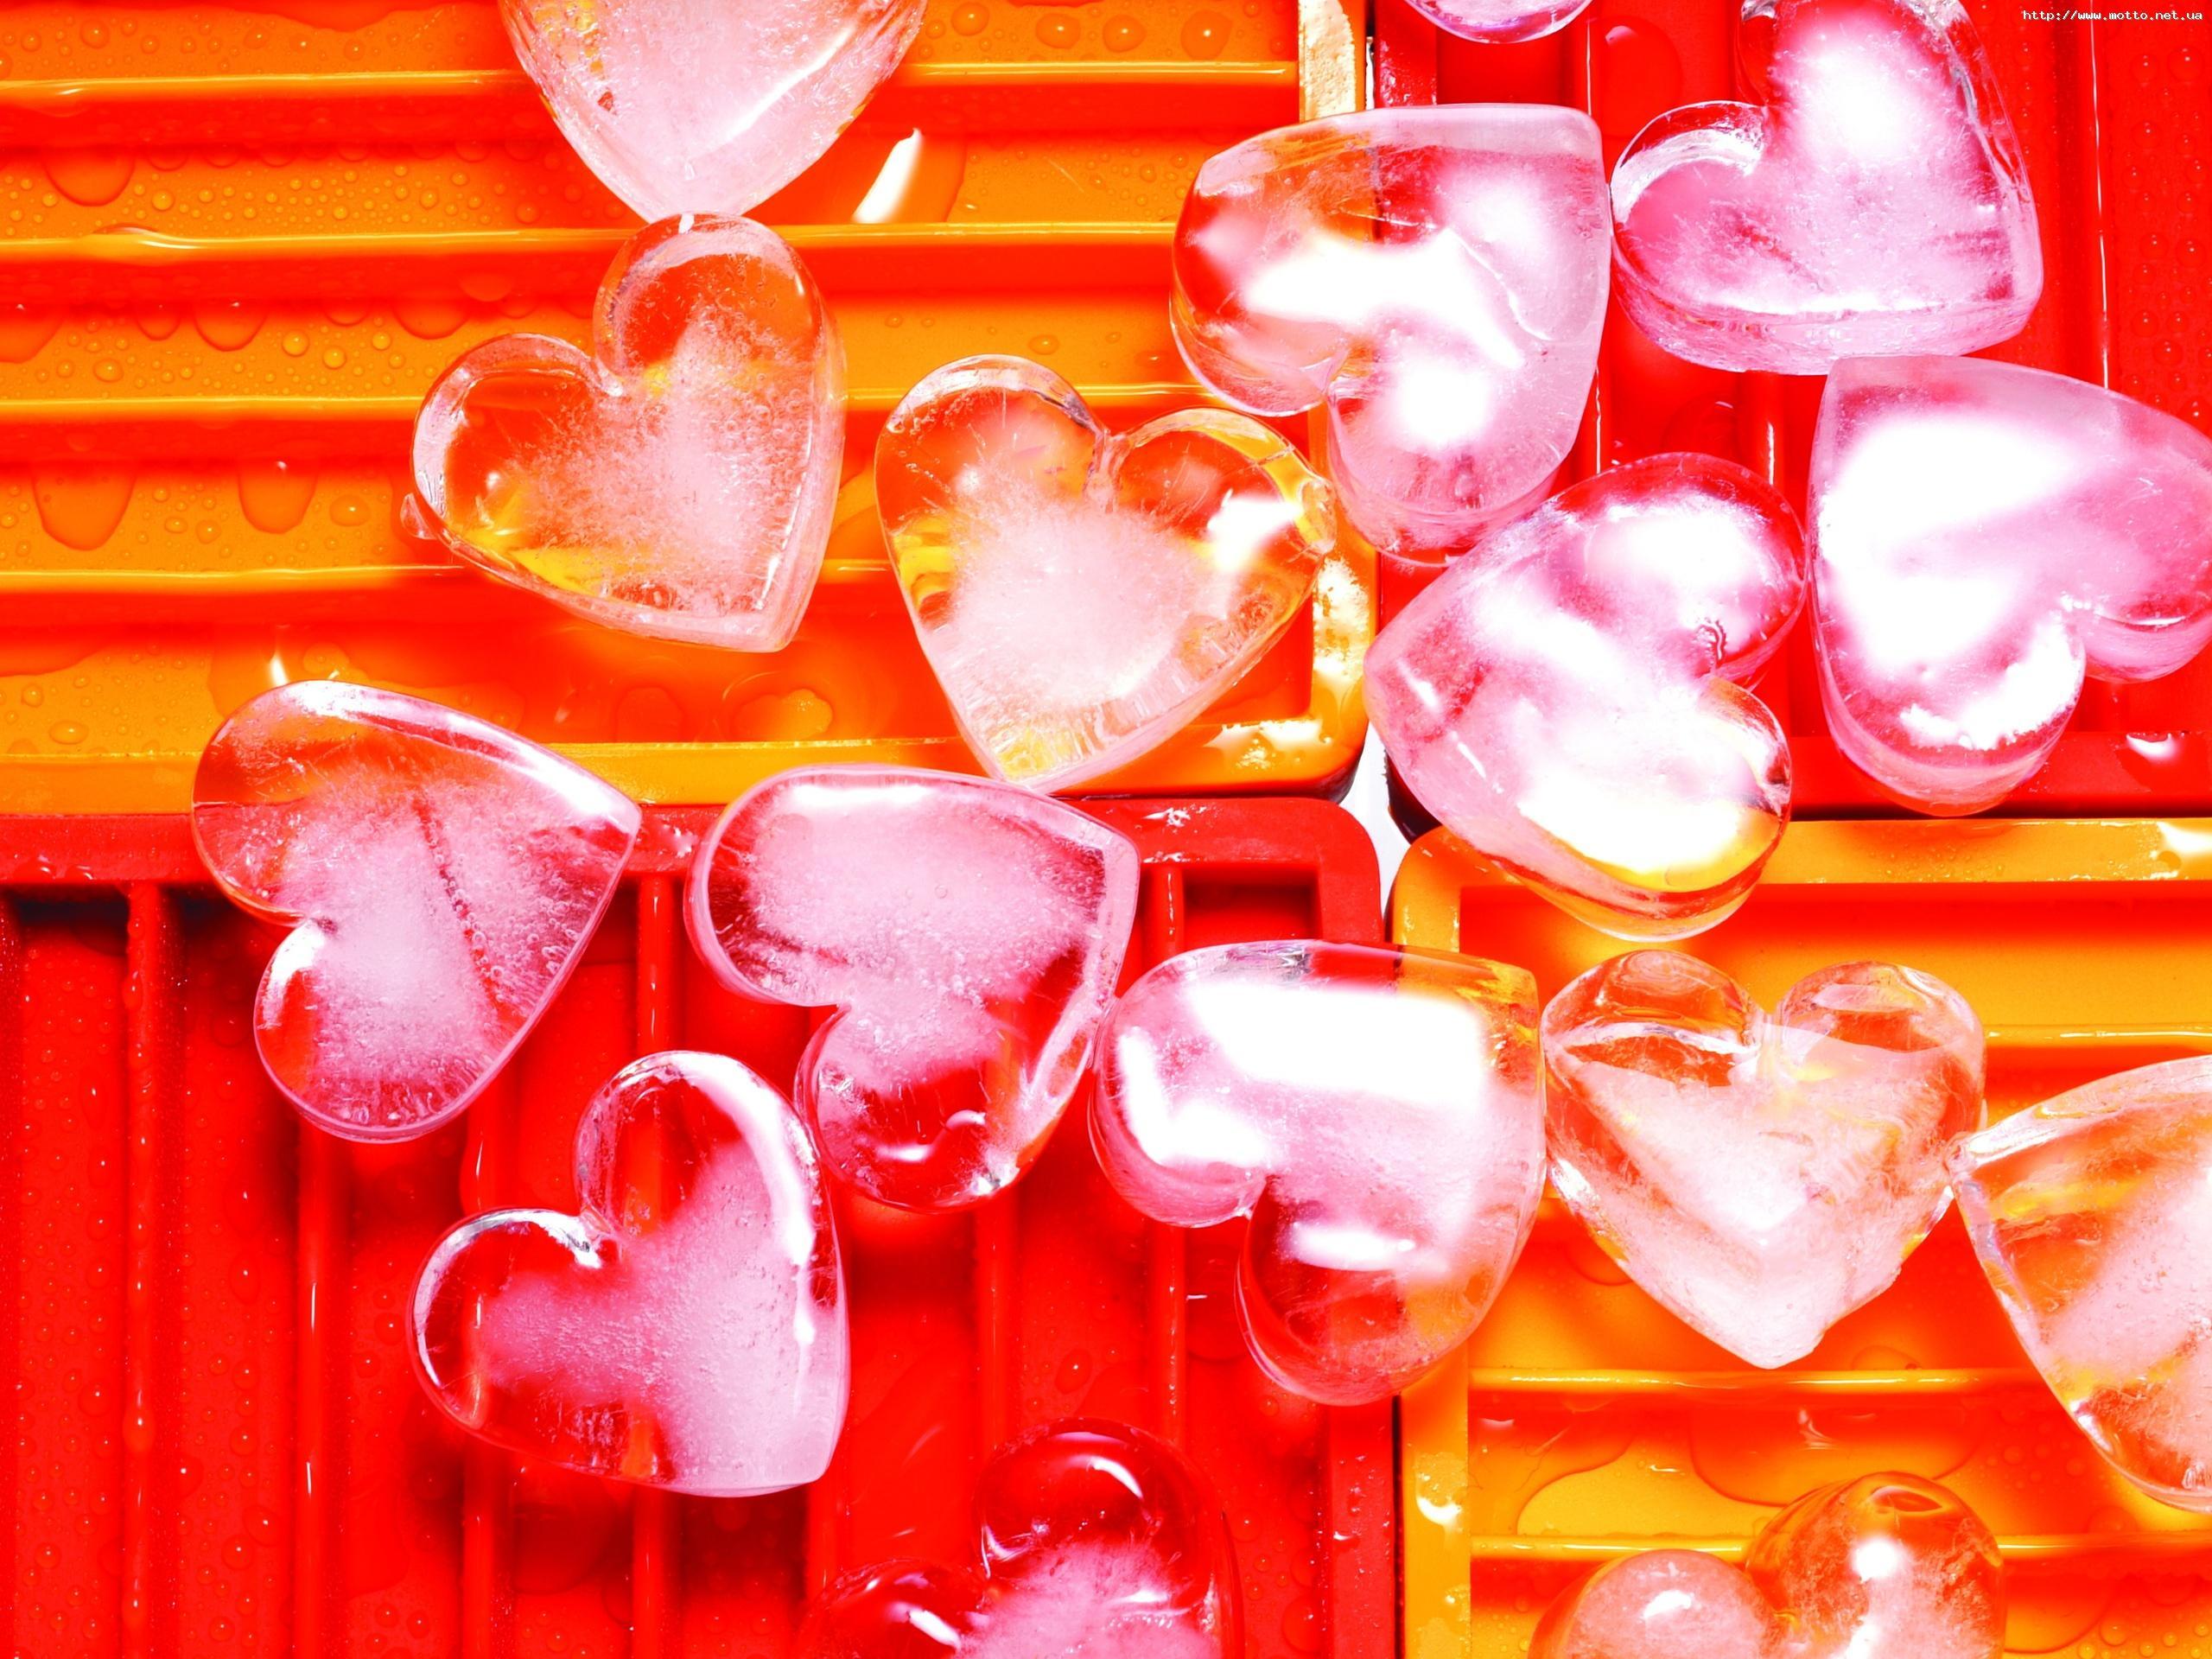 Два ледяных сердца  № 3490320  скачать